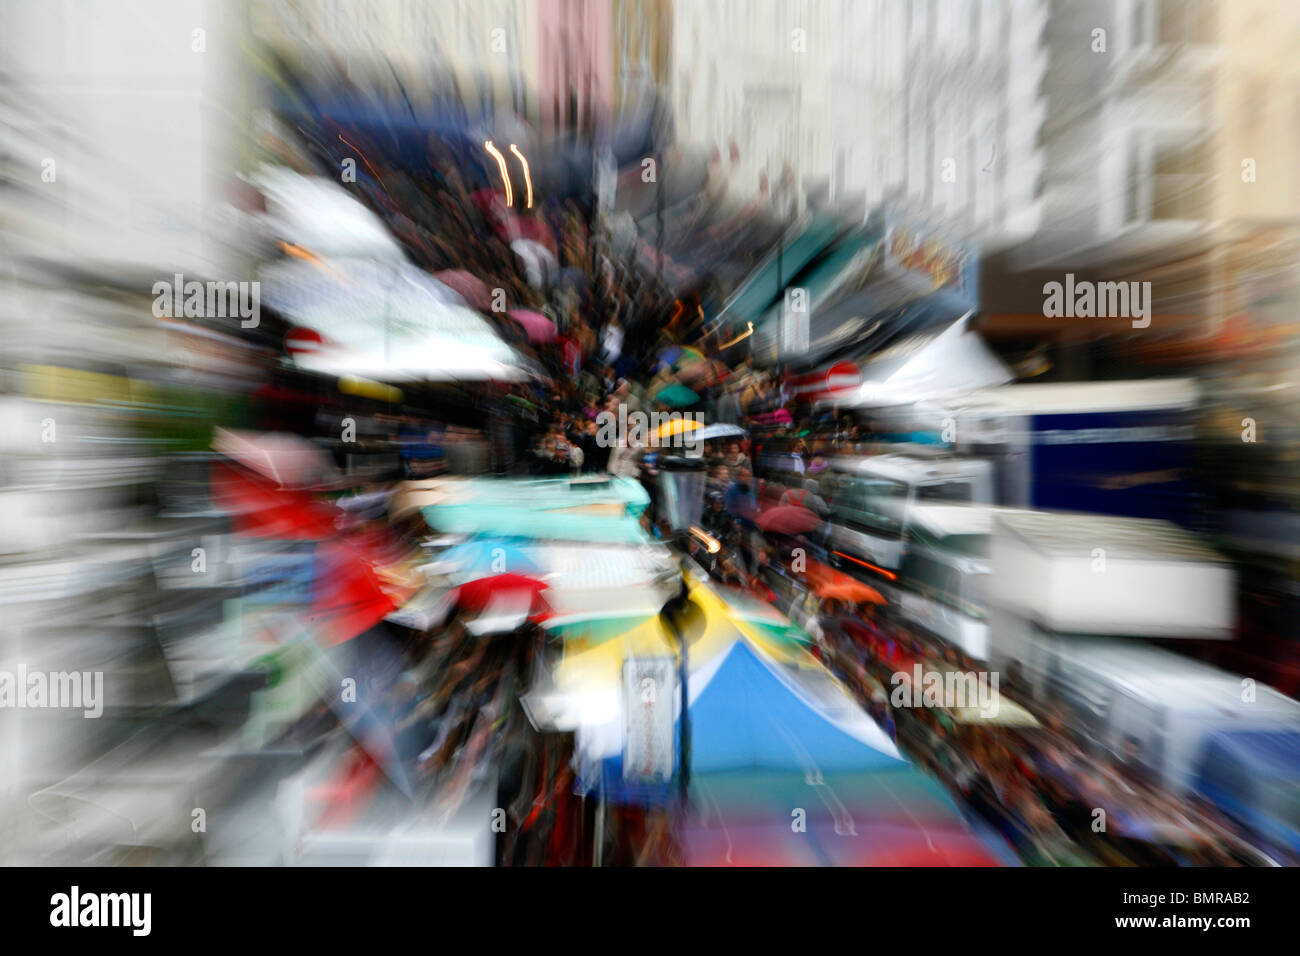 Explosion zoom shot Portobello Road Market, Notting Hill, London, UK - Stock Image